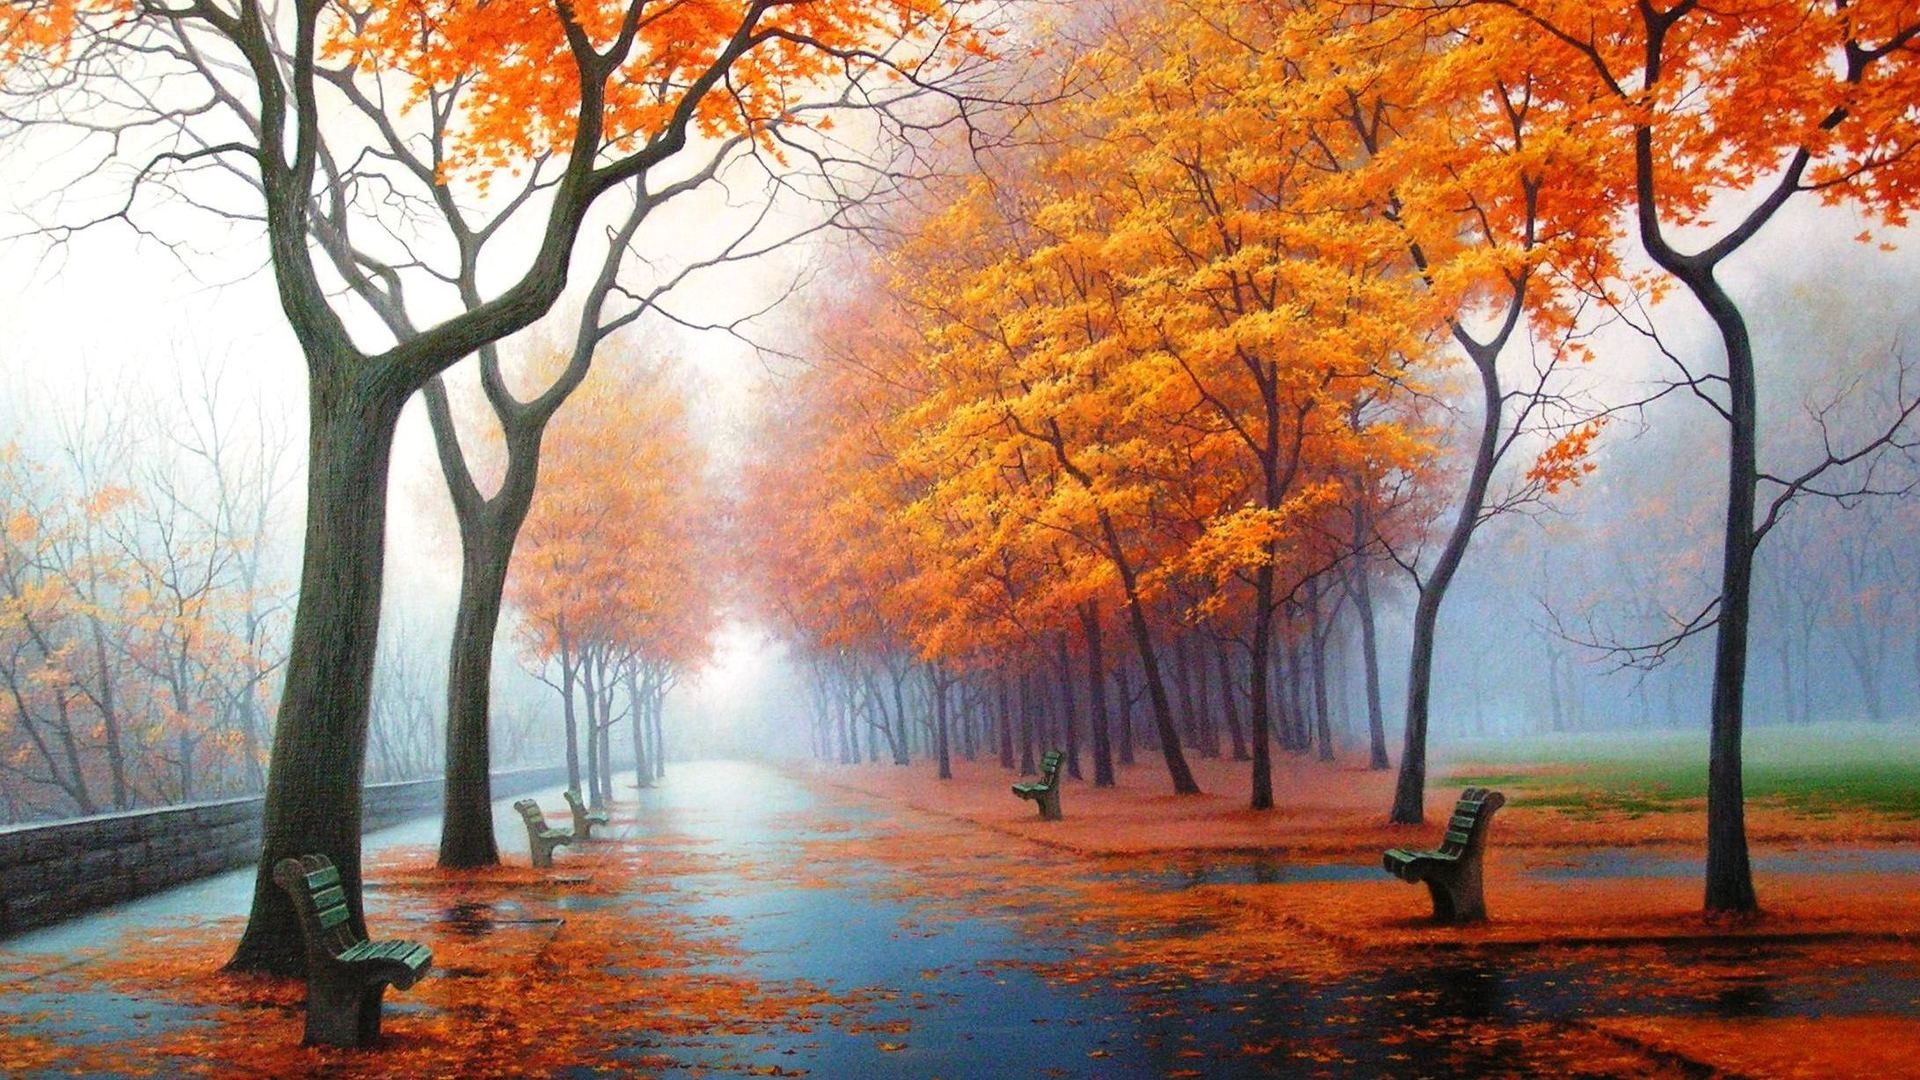 Autumn wallpaper beautiful free.